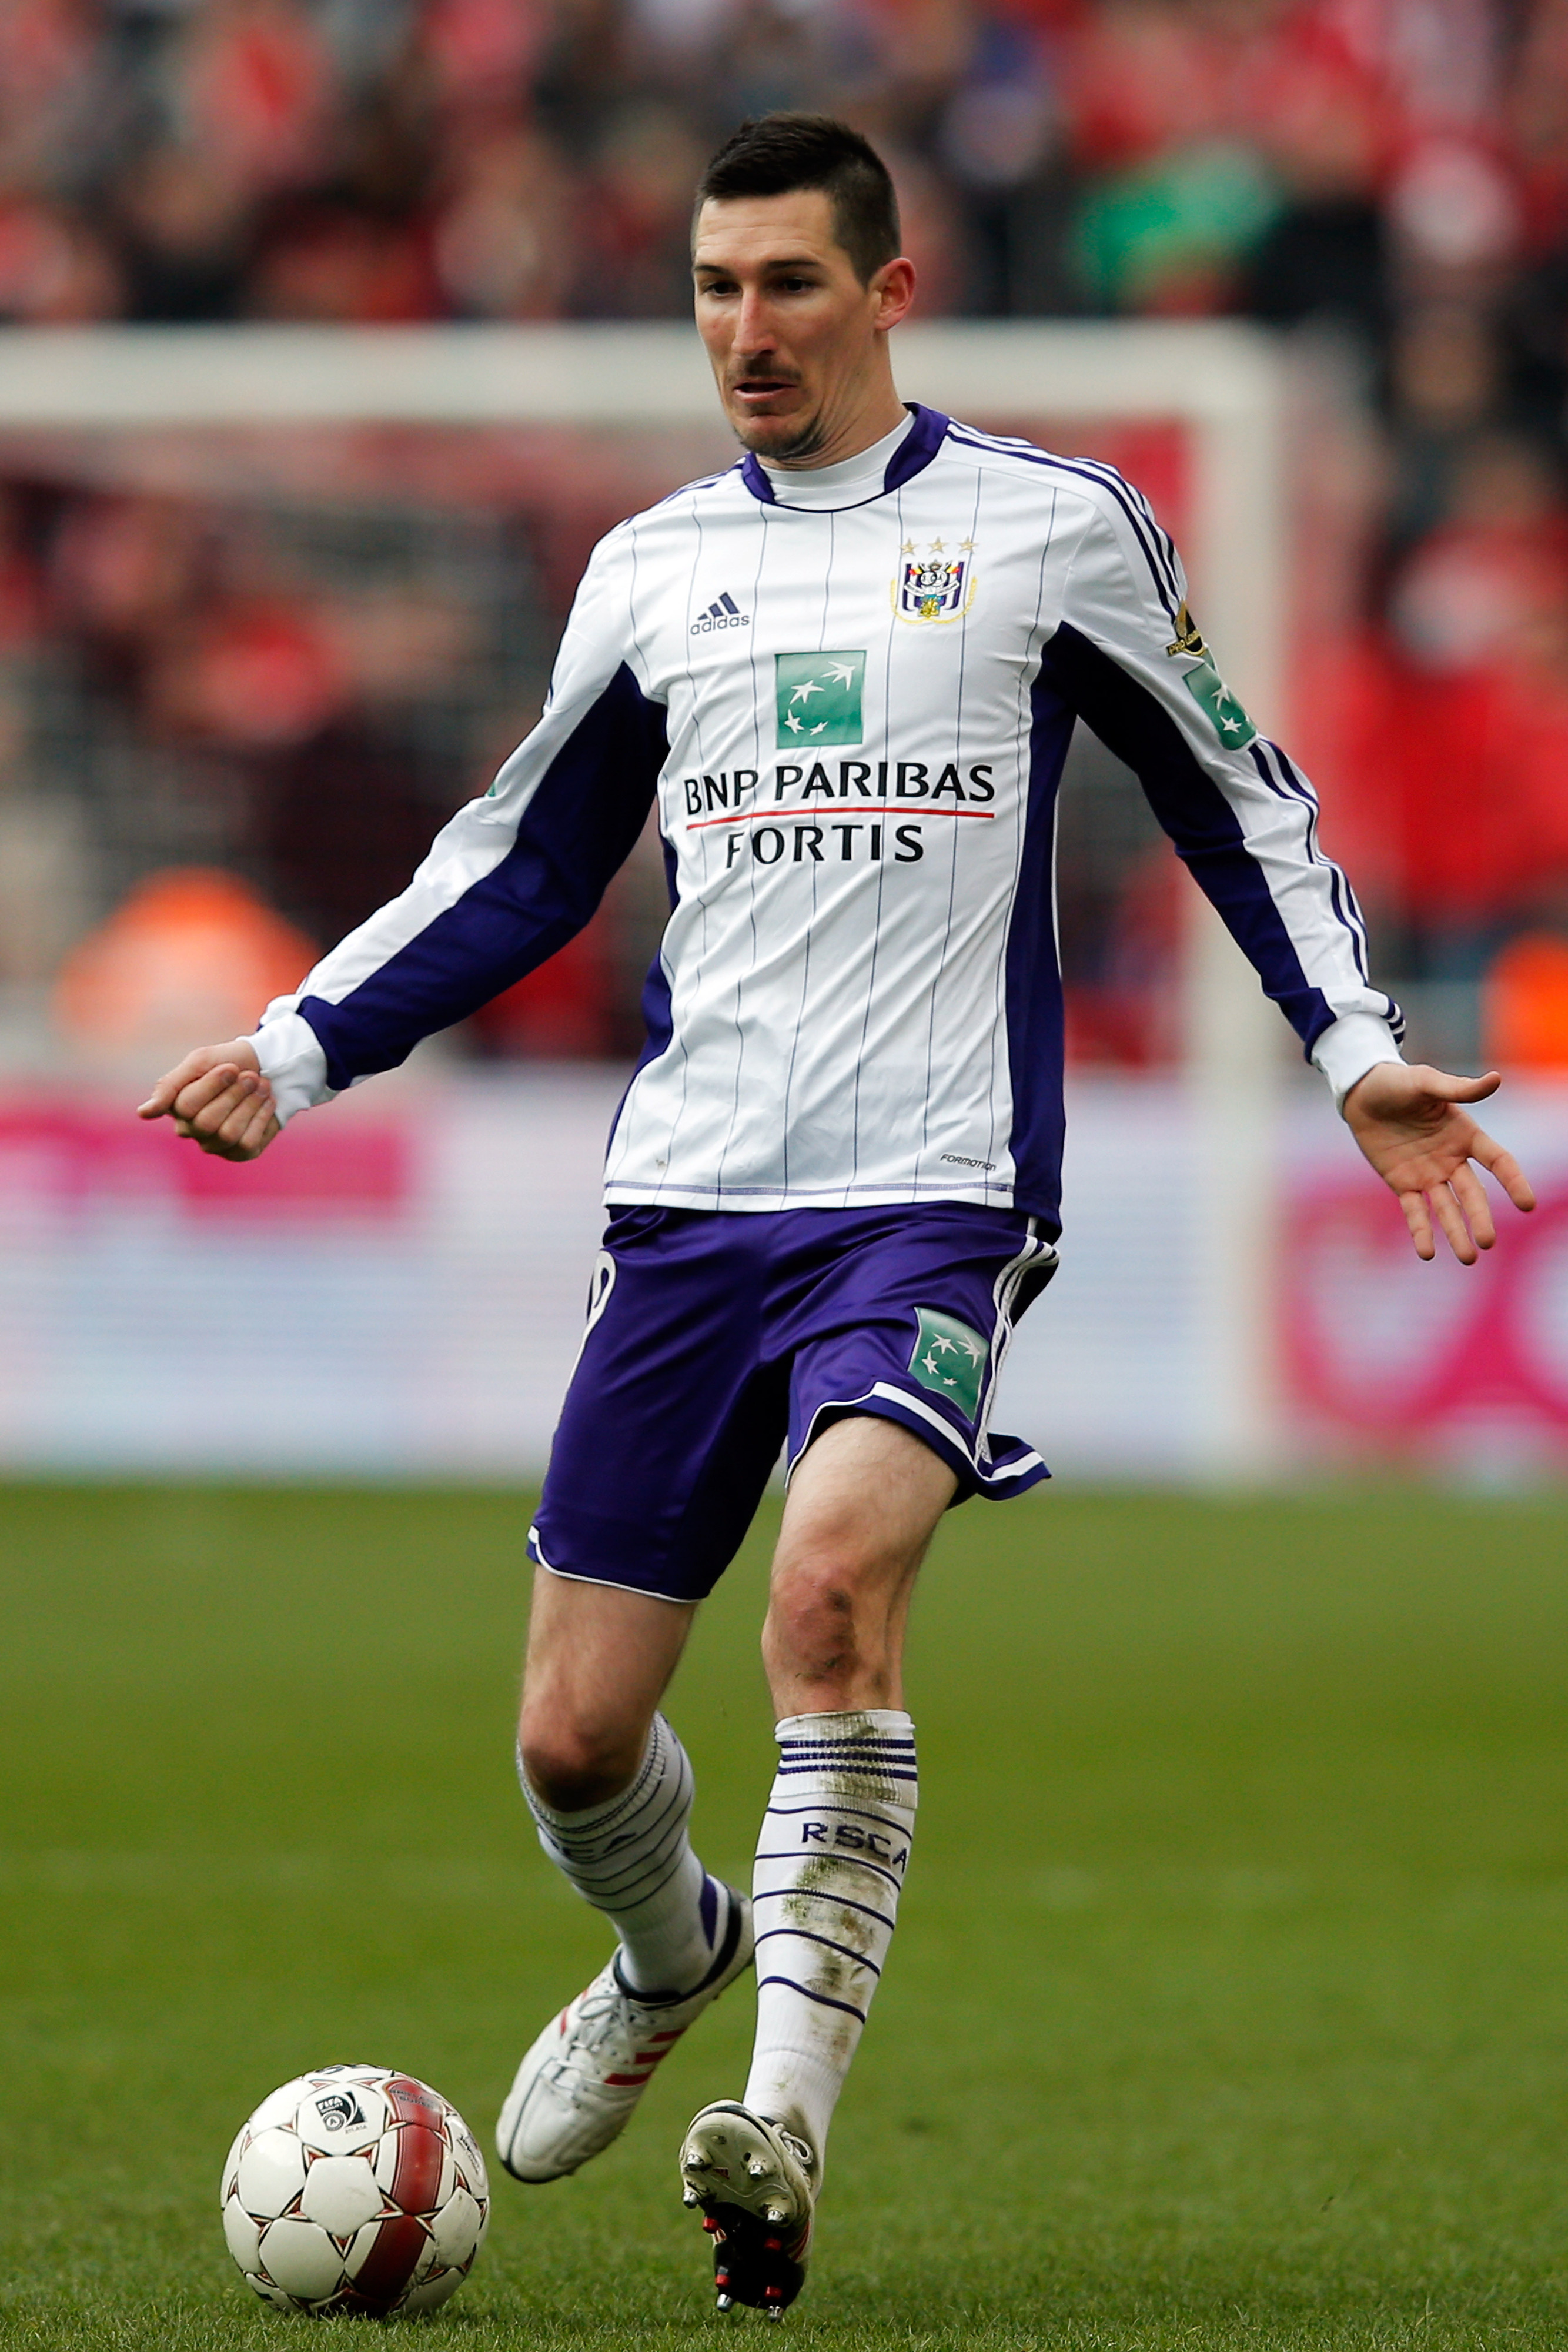 Ex-Chivas USA midfielder Sacha Kljestan now in the UEFA Champions League with Anderlecht